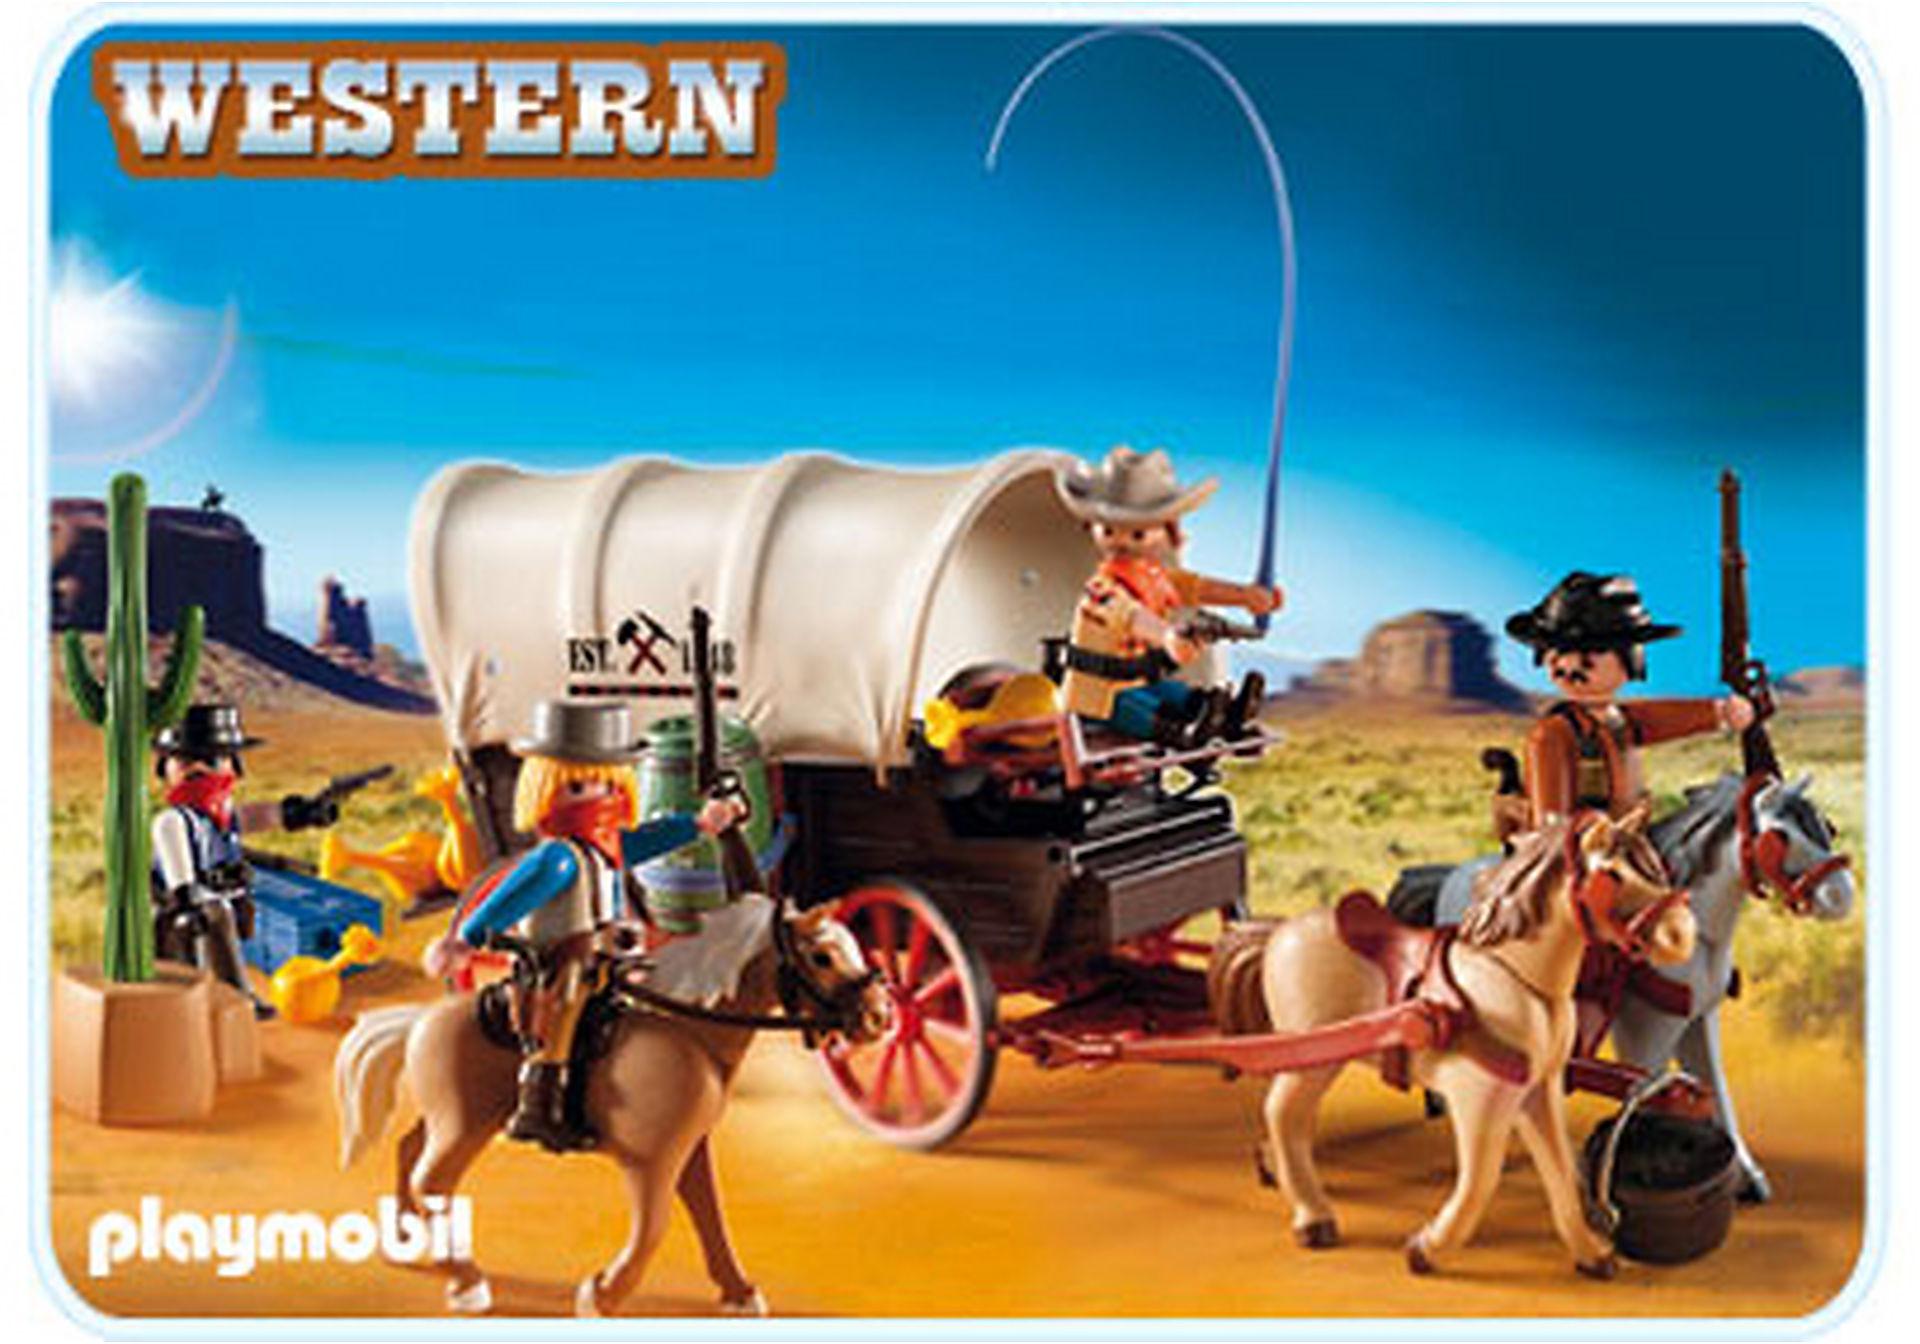 http://media.playmobil.com/i/playmobil/5248-A_product_detail/Planwagen mit Überfall